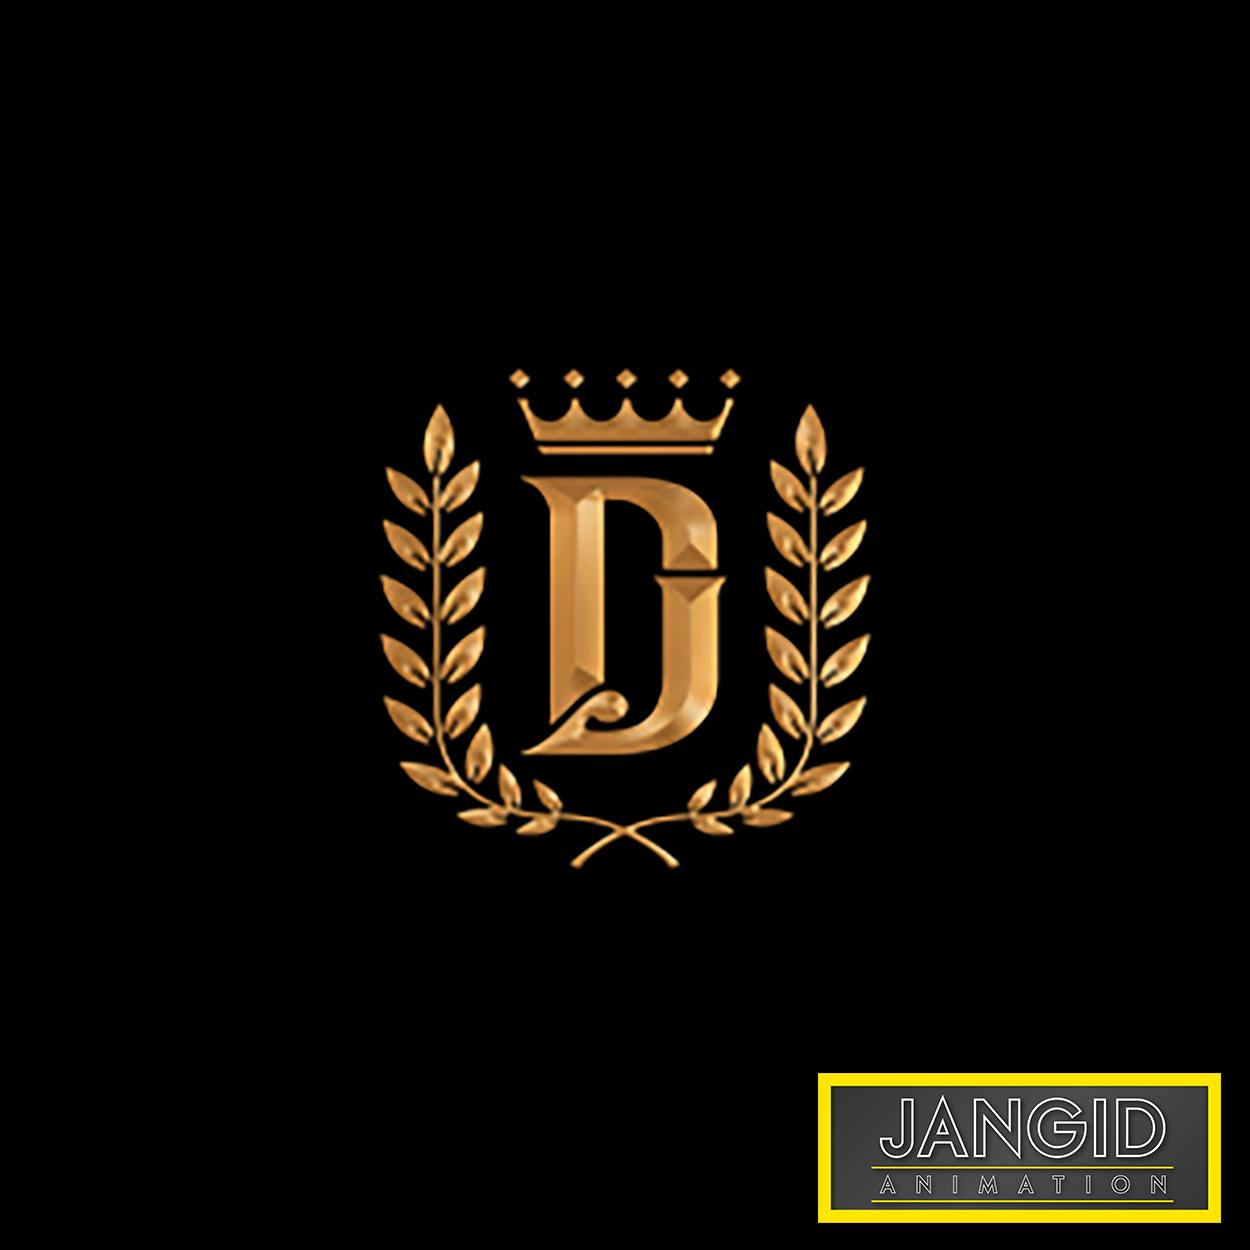 Dj Golden Cool Logo Design By Jangid Animation Jangid Animation